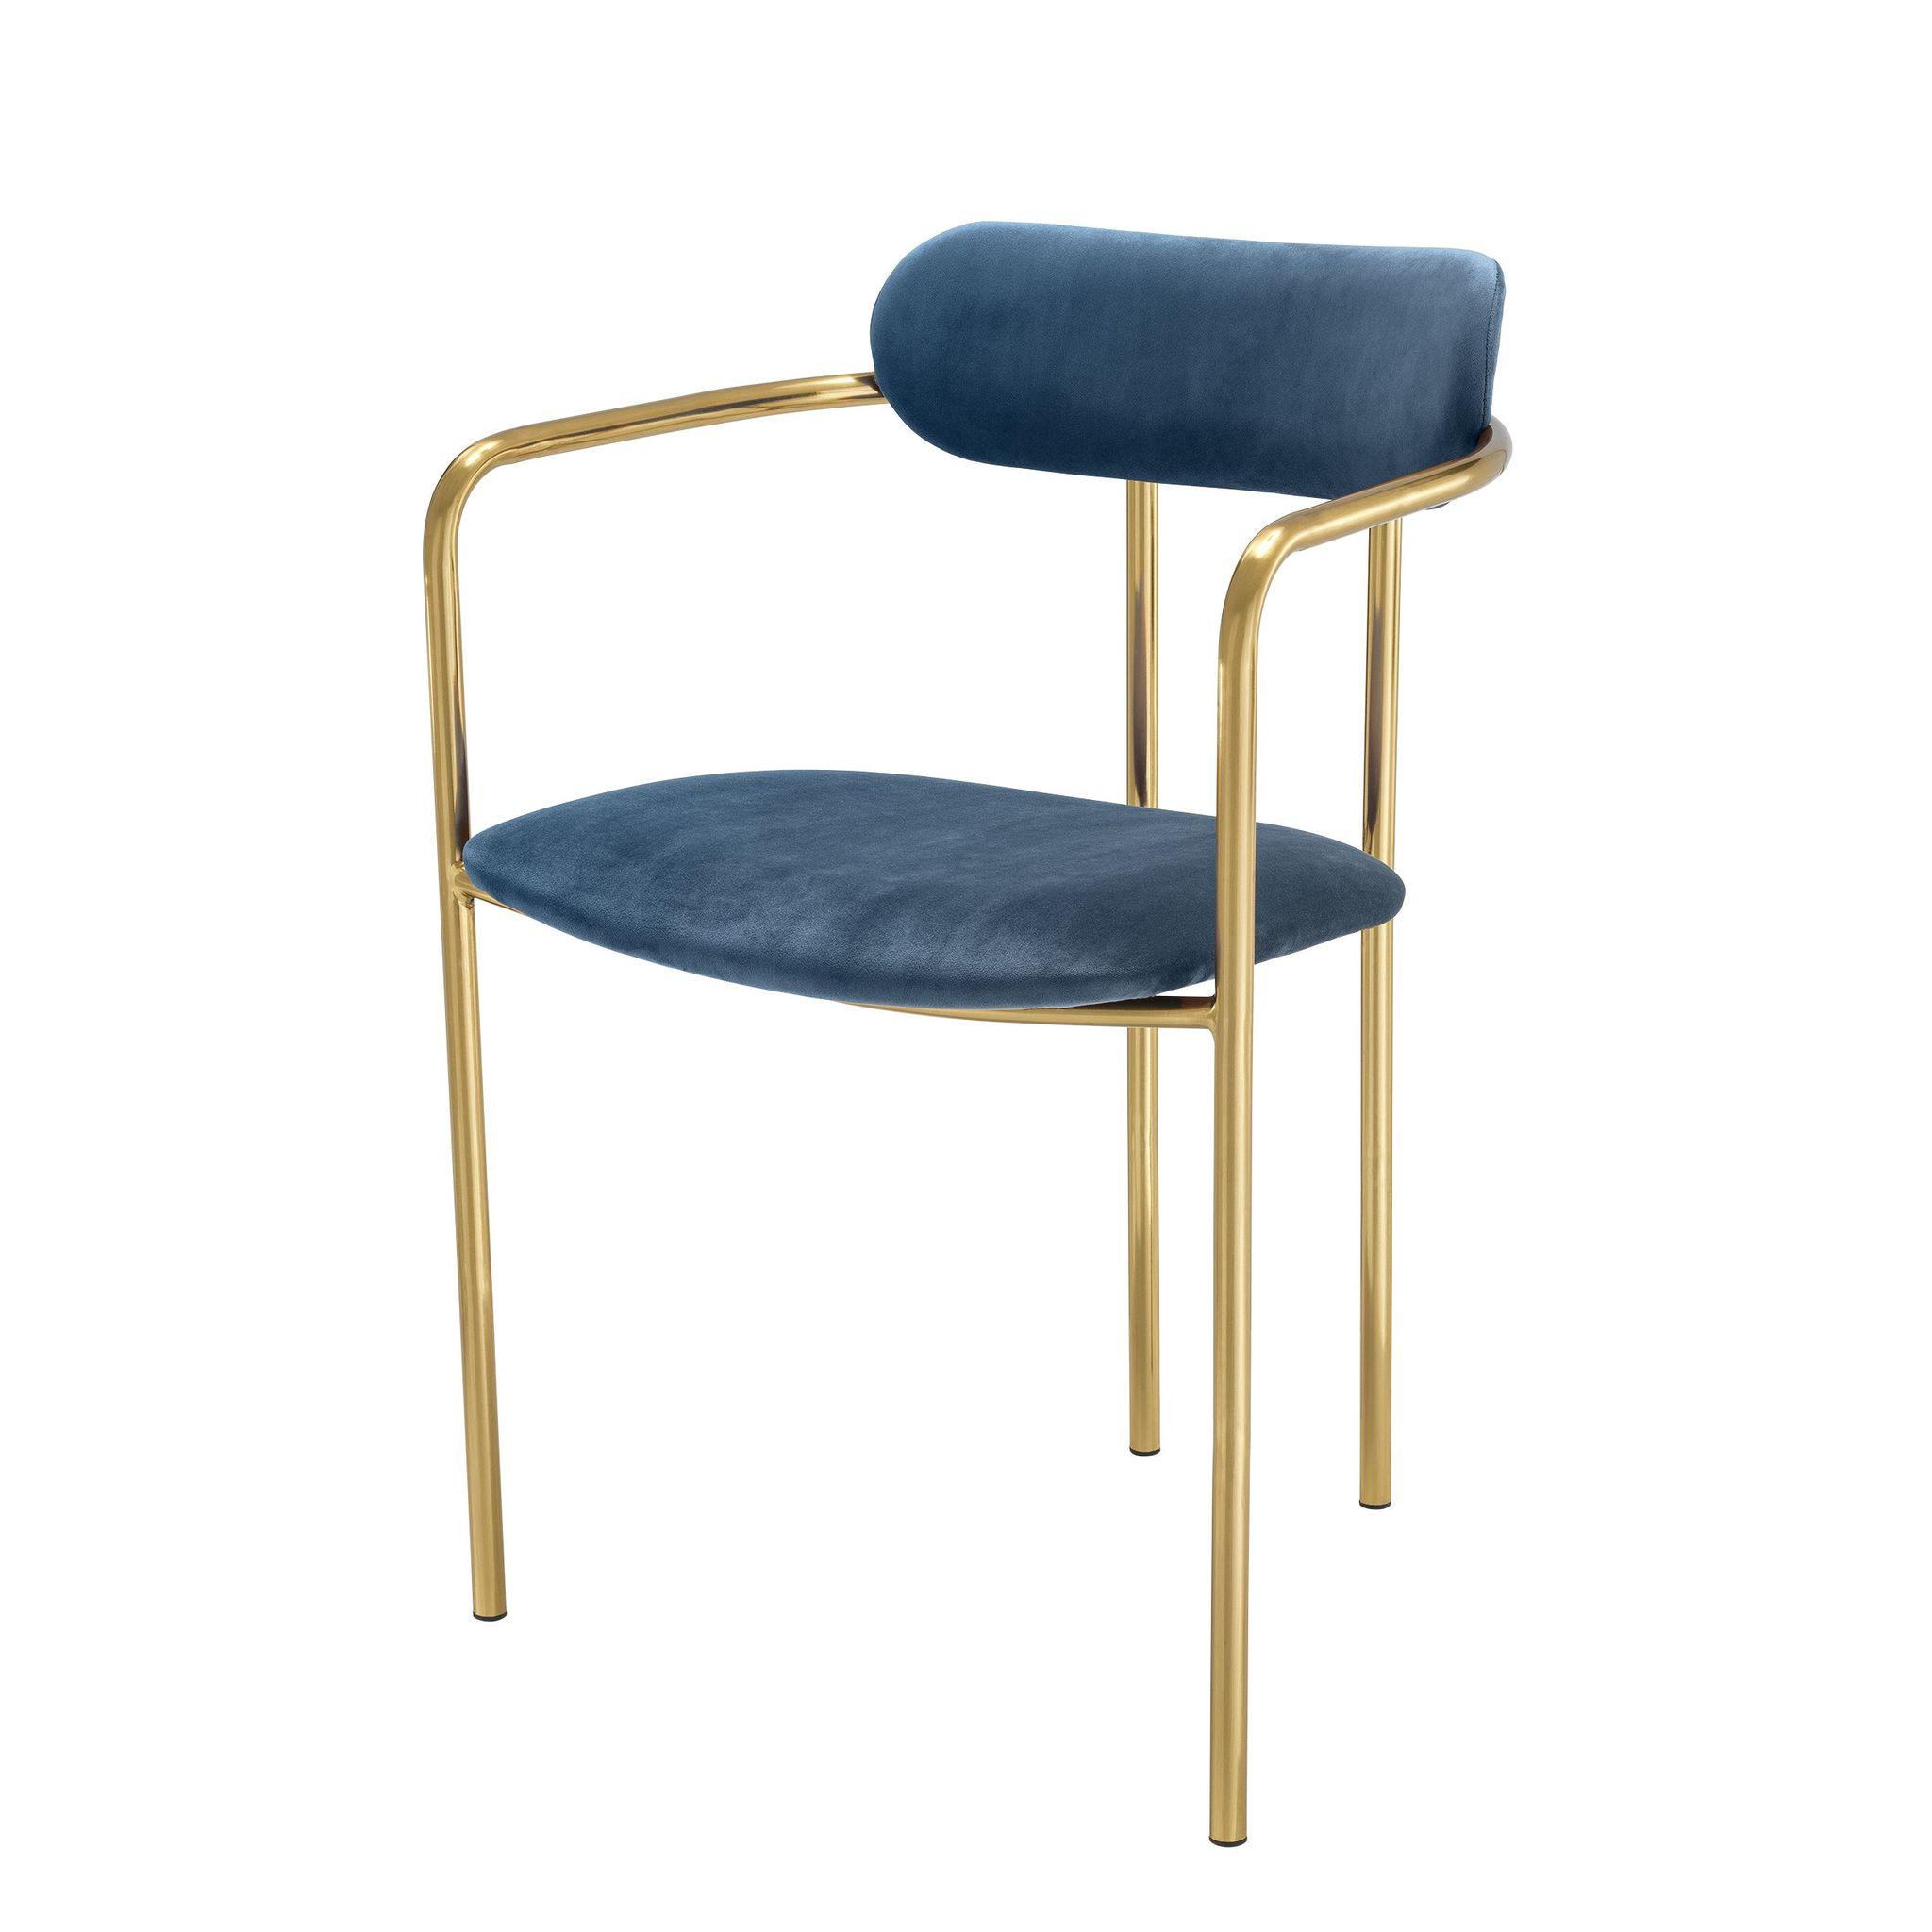 Обеденный стул Eichholtz 113609 Singer (2 шт.)